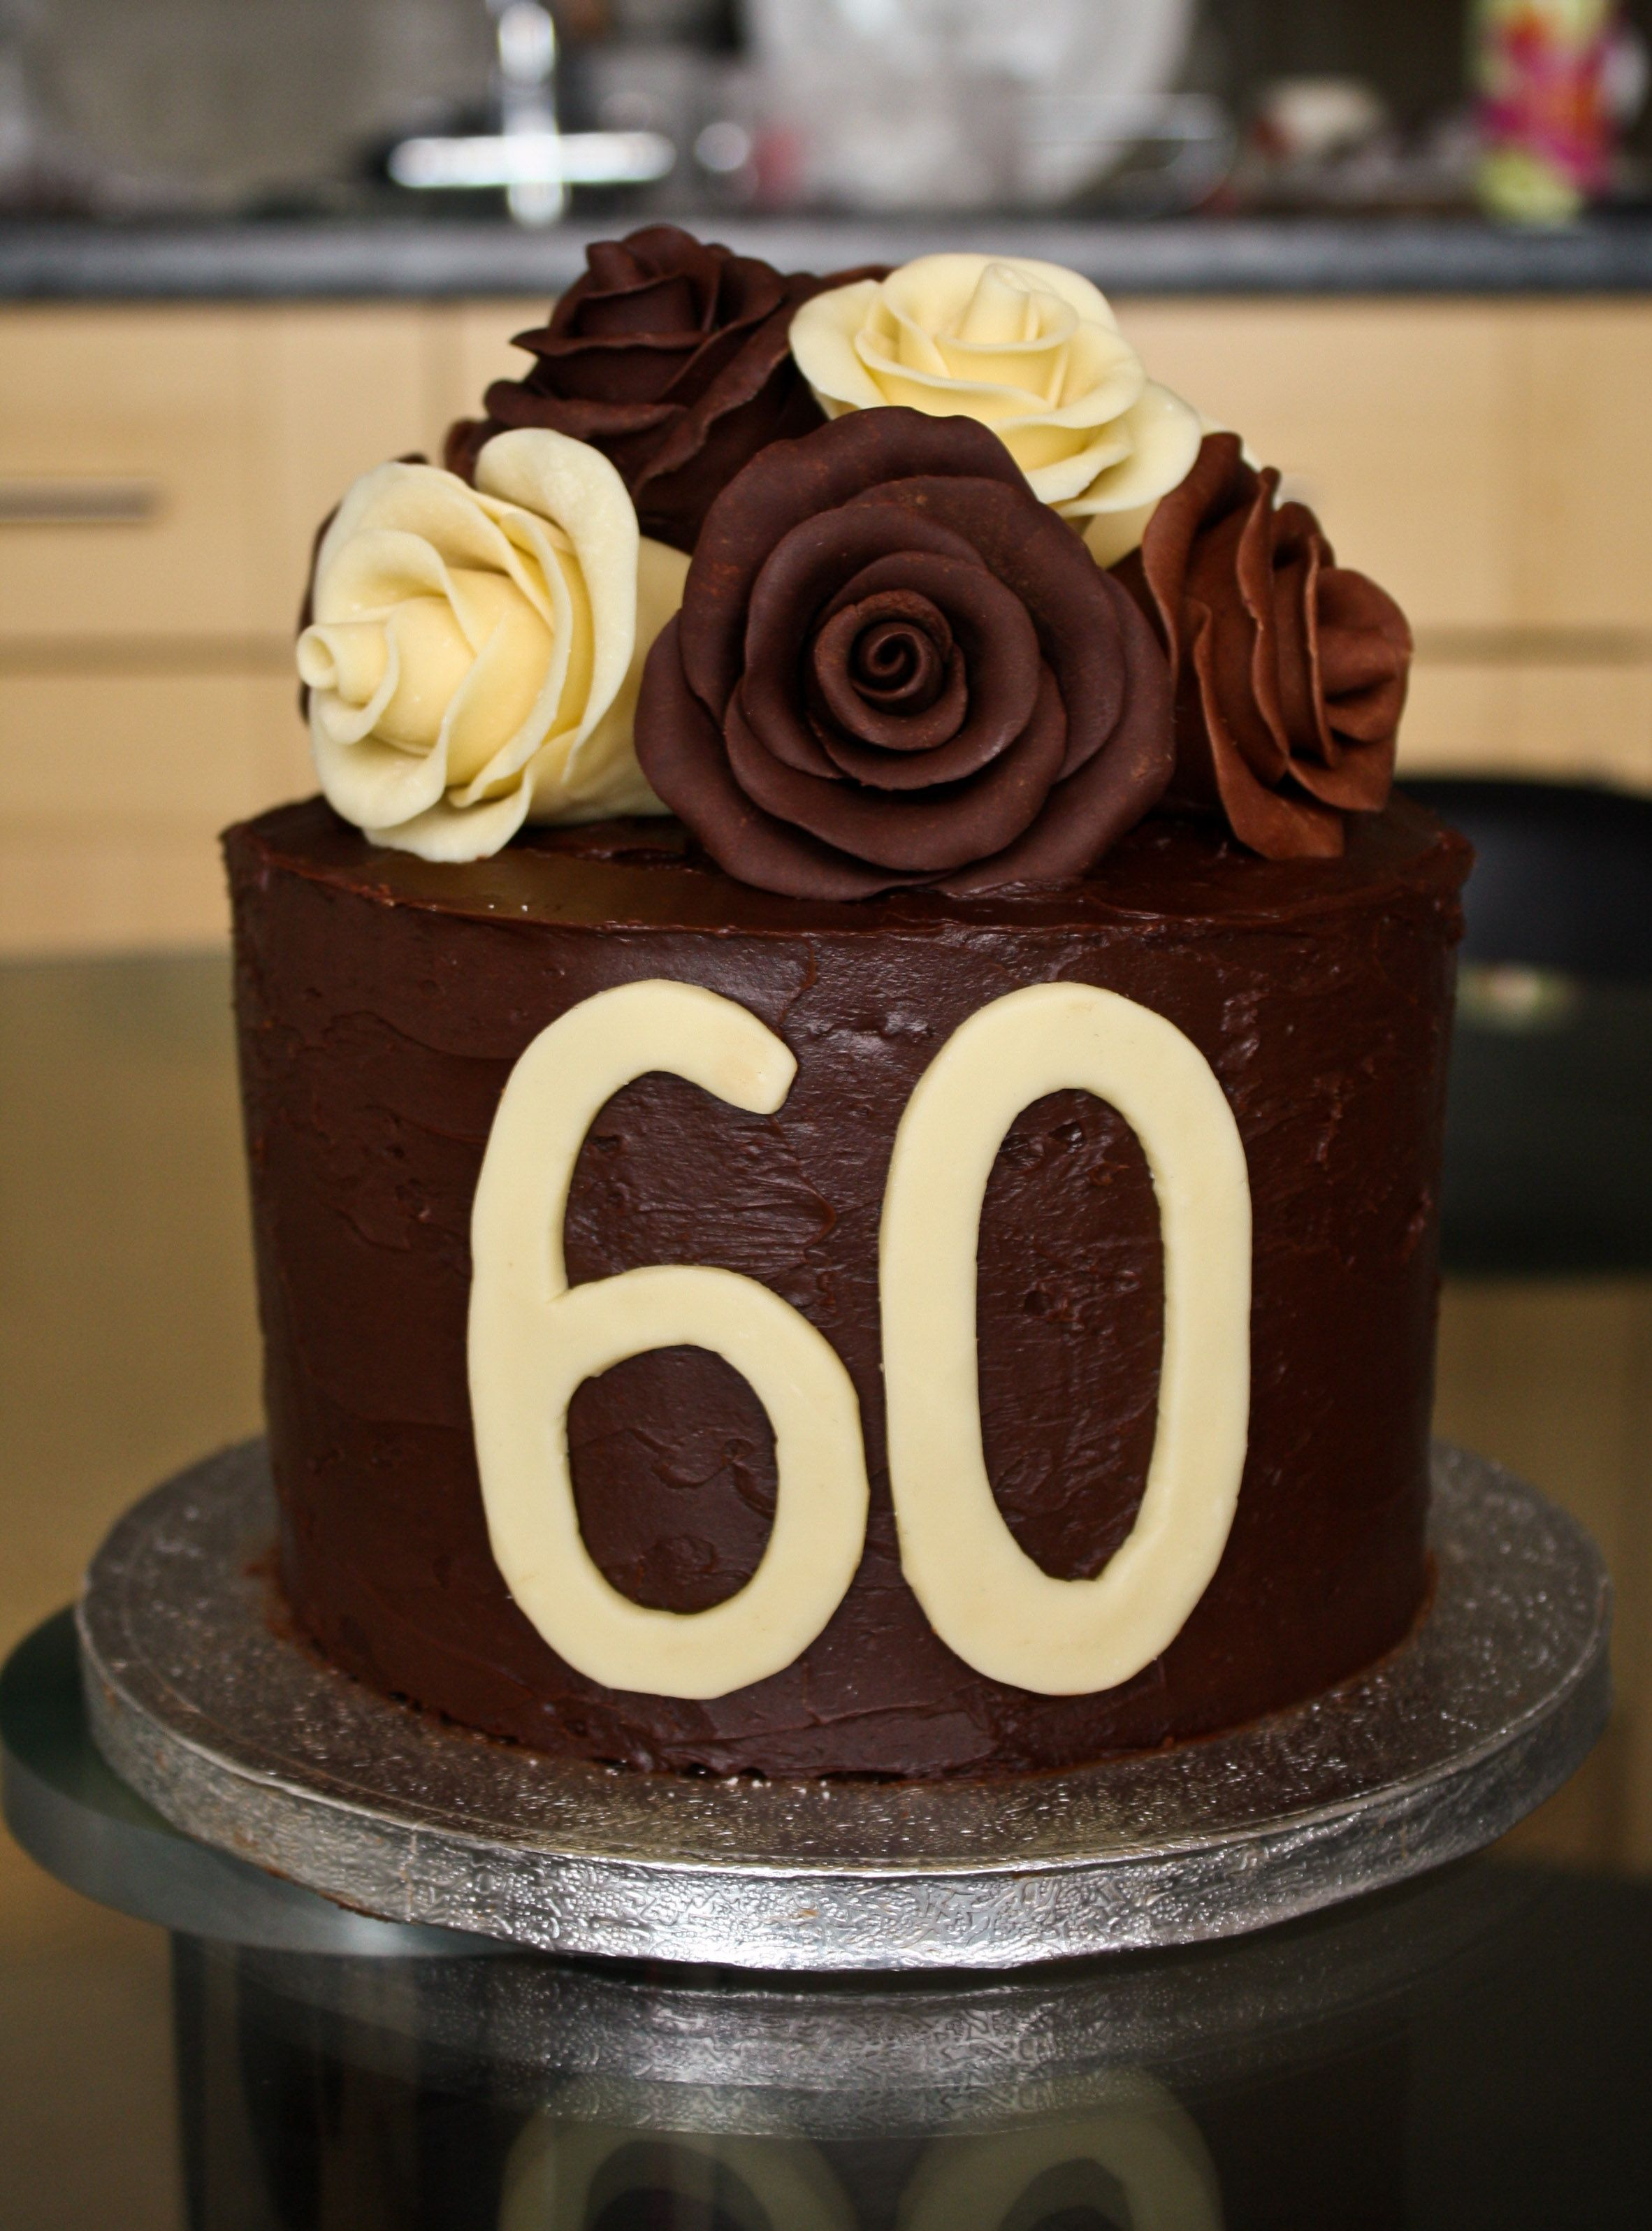 Chocolate Roses Birthday Cake 60th birthday cakes